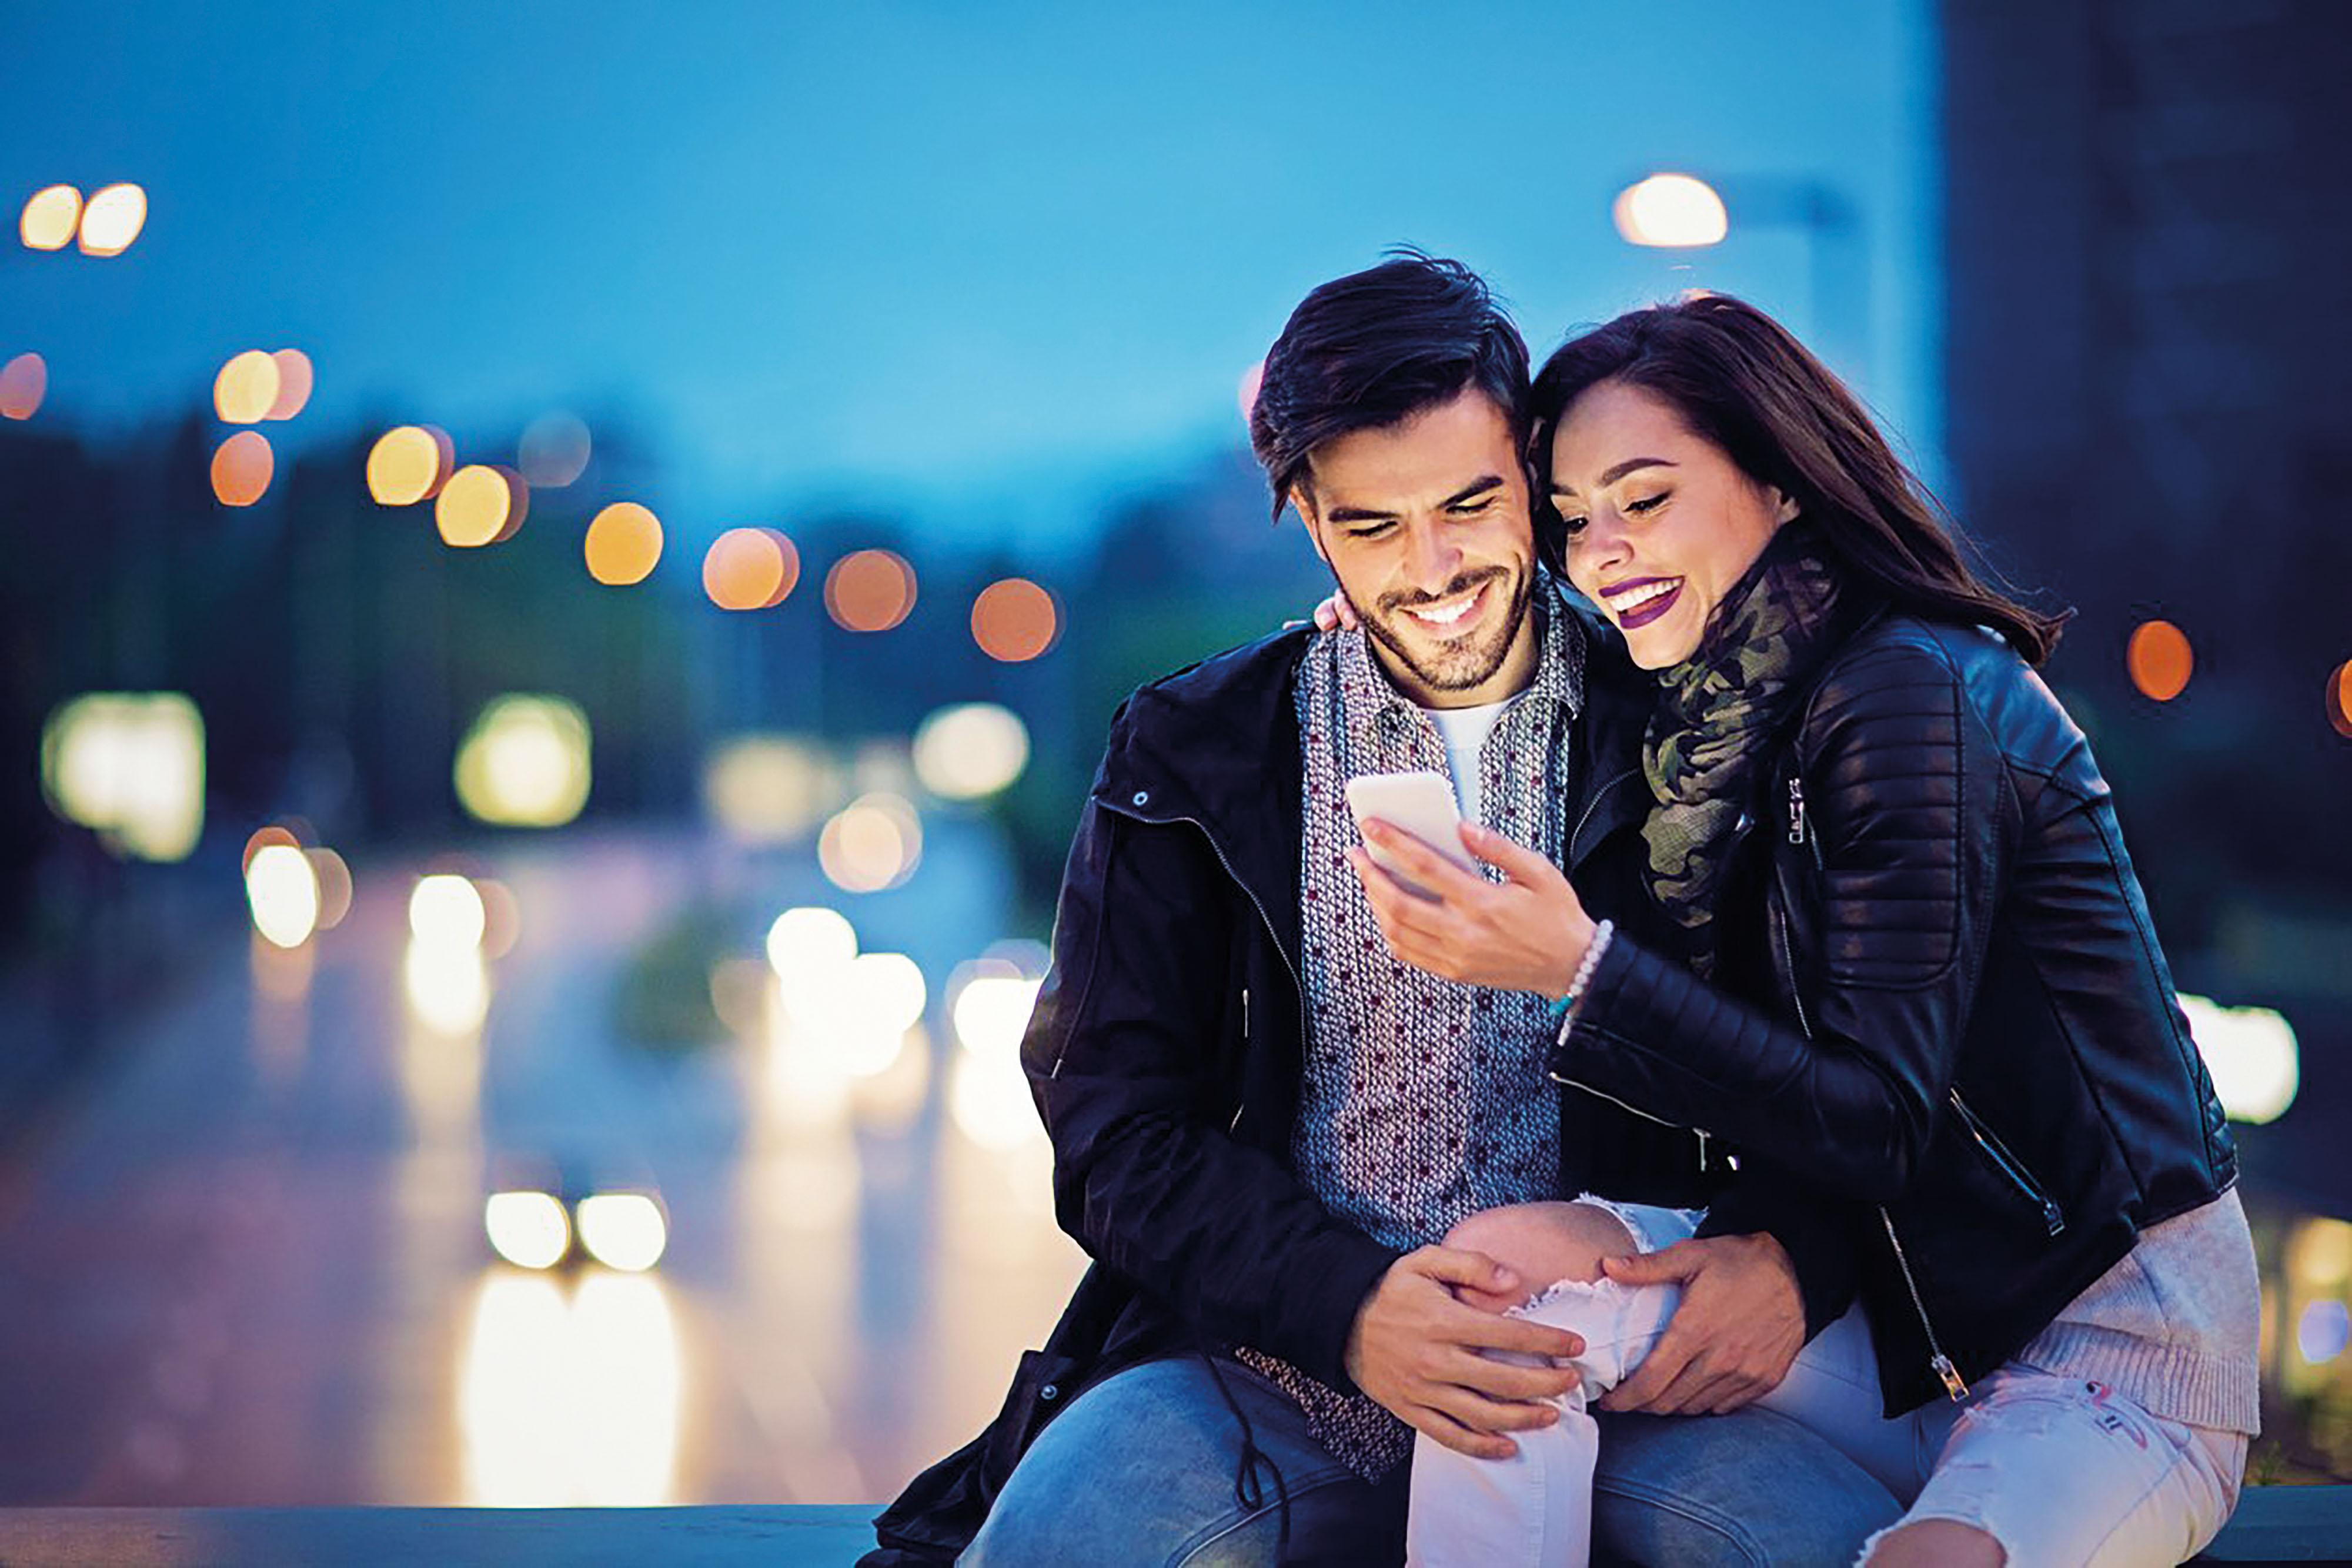 Kar dating example